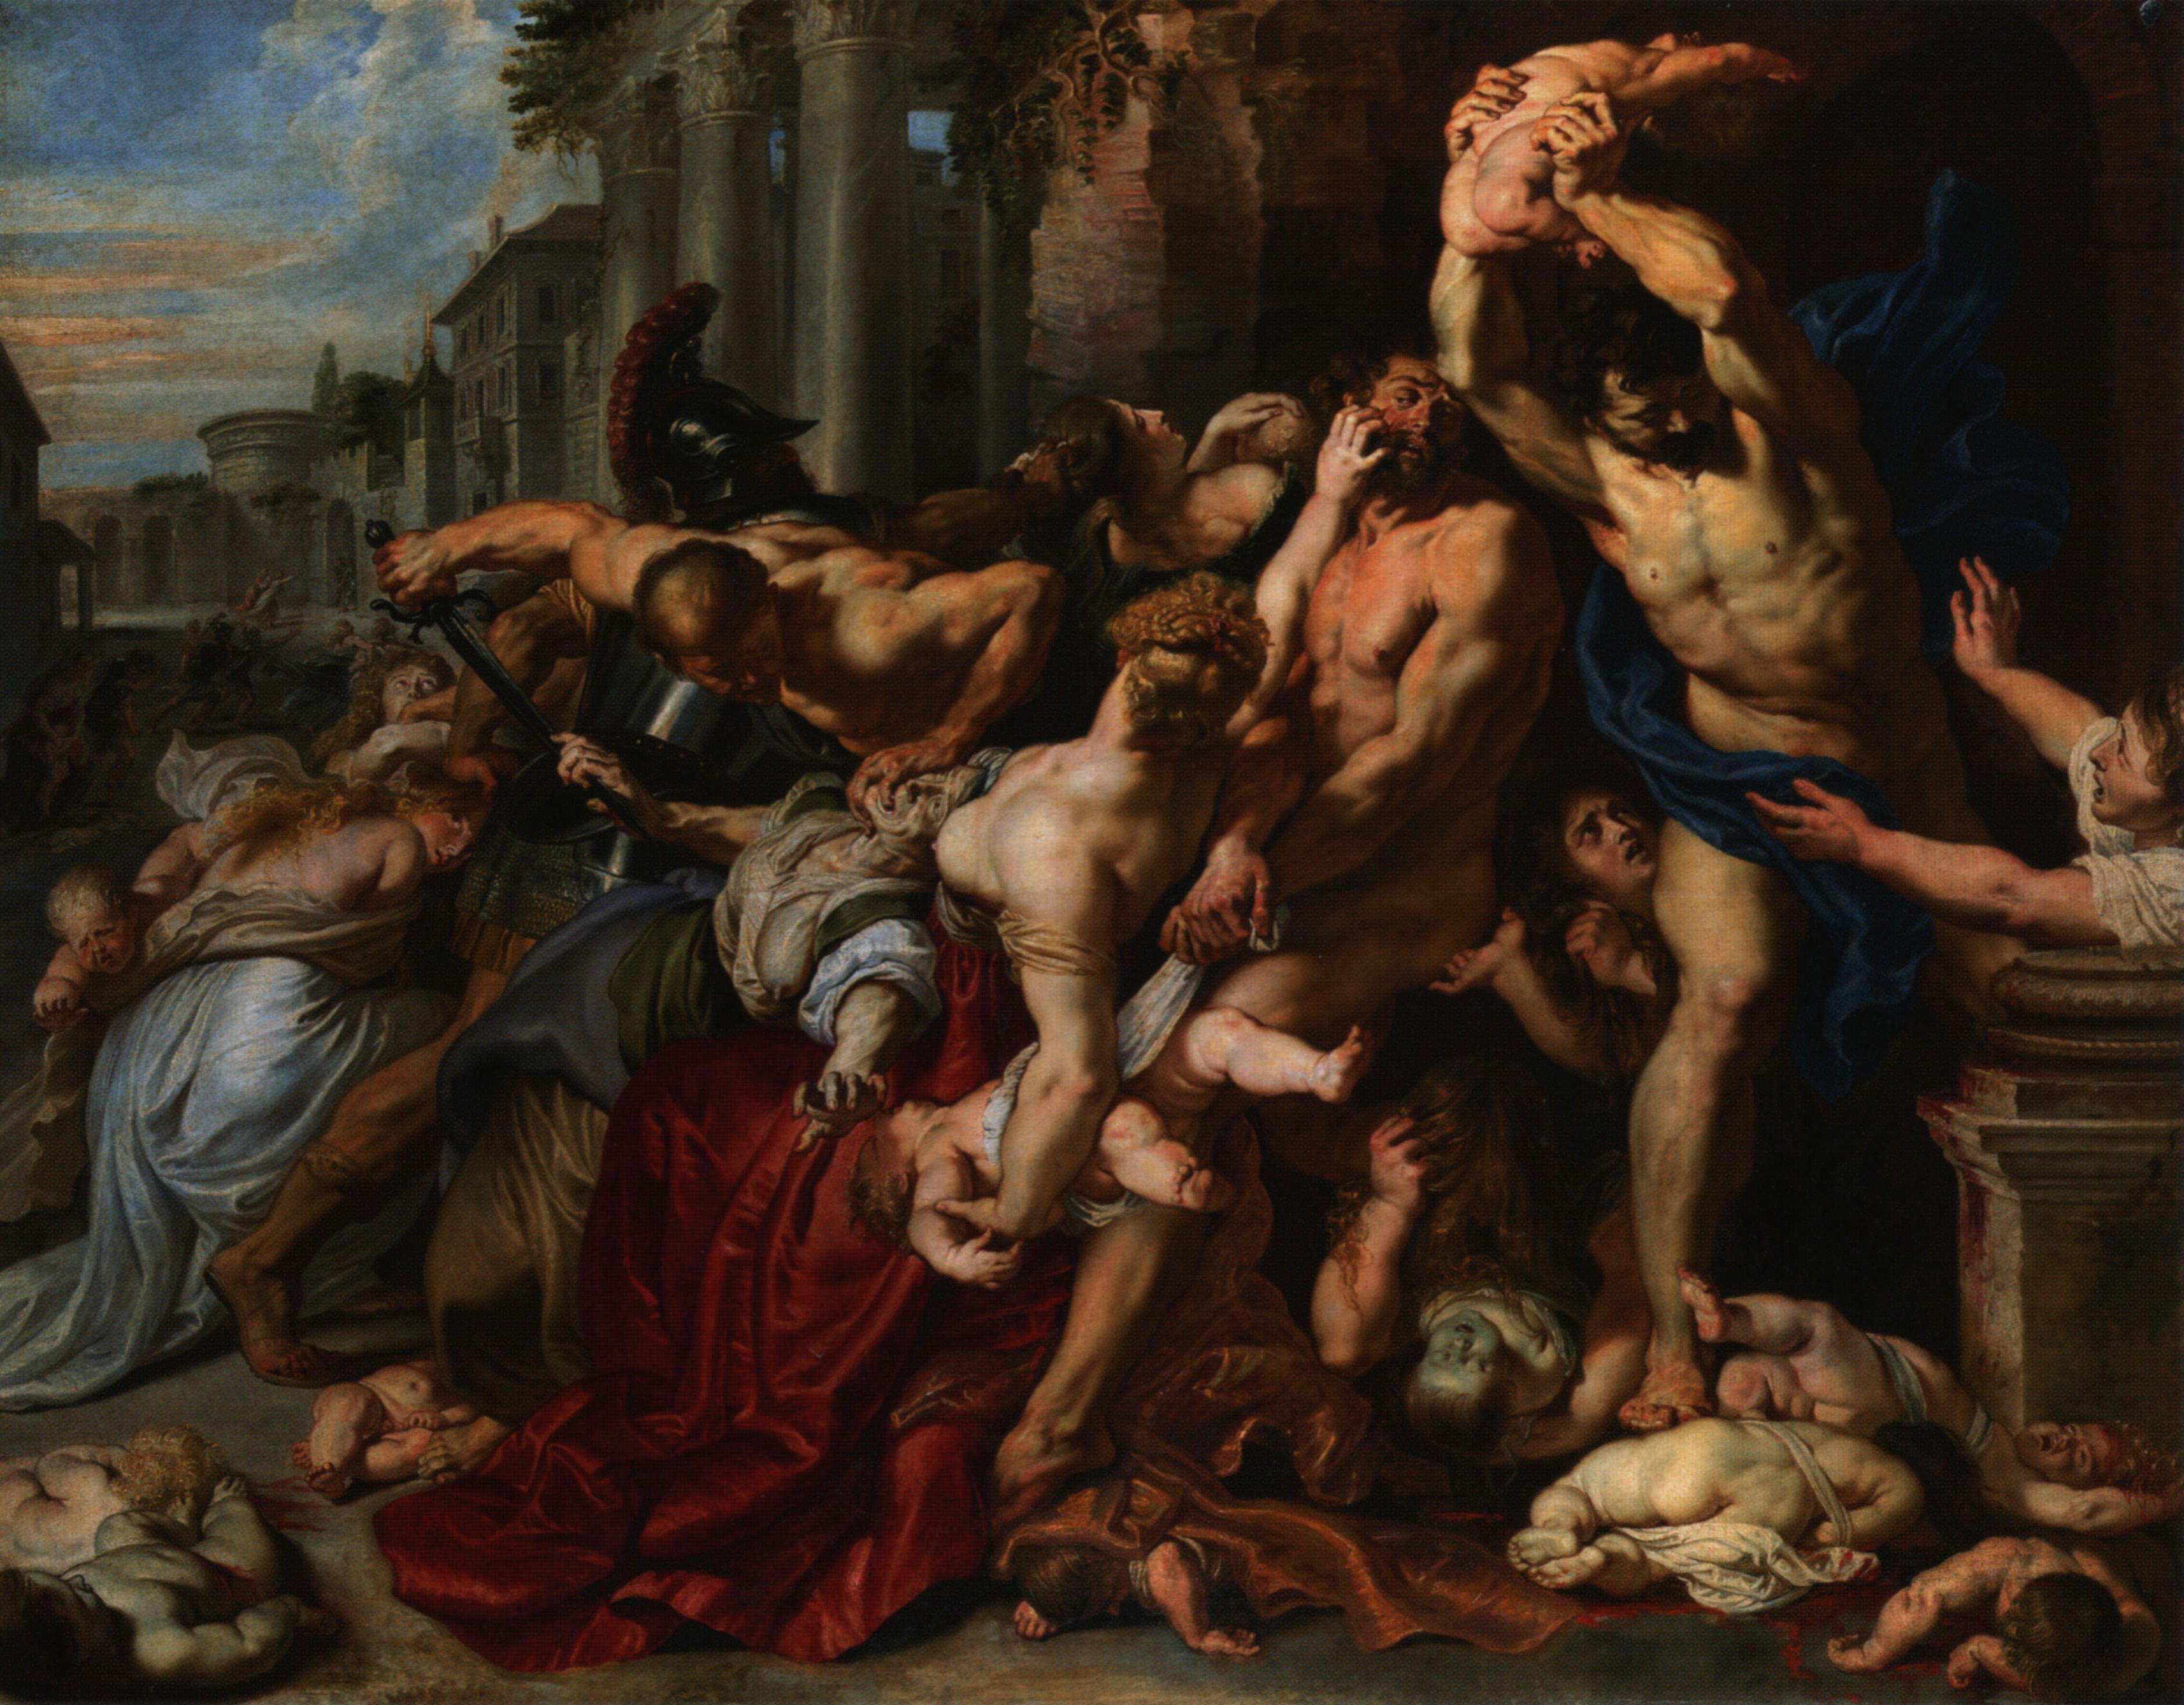 Massacre of the Innocents, Rubens 1611-12